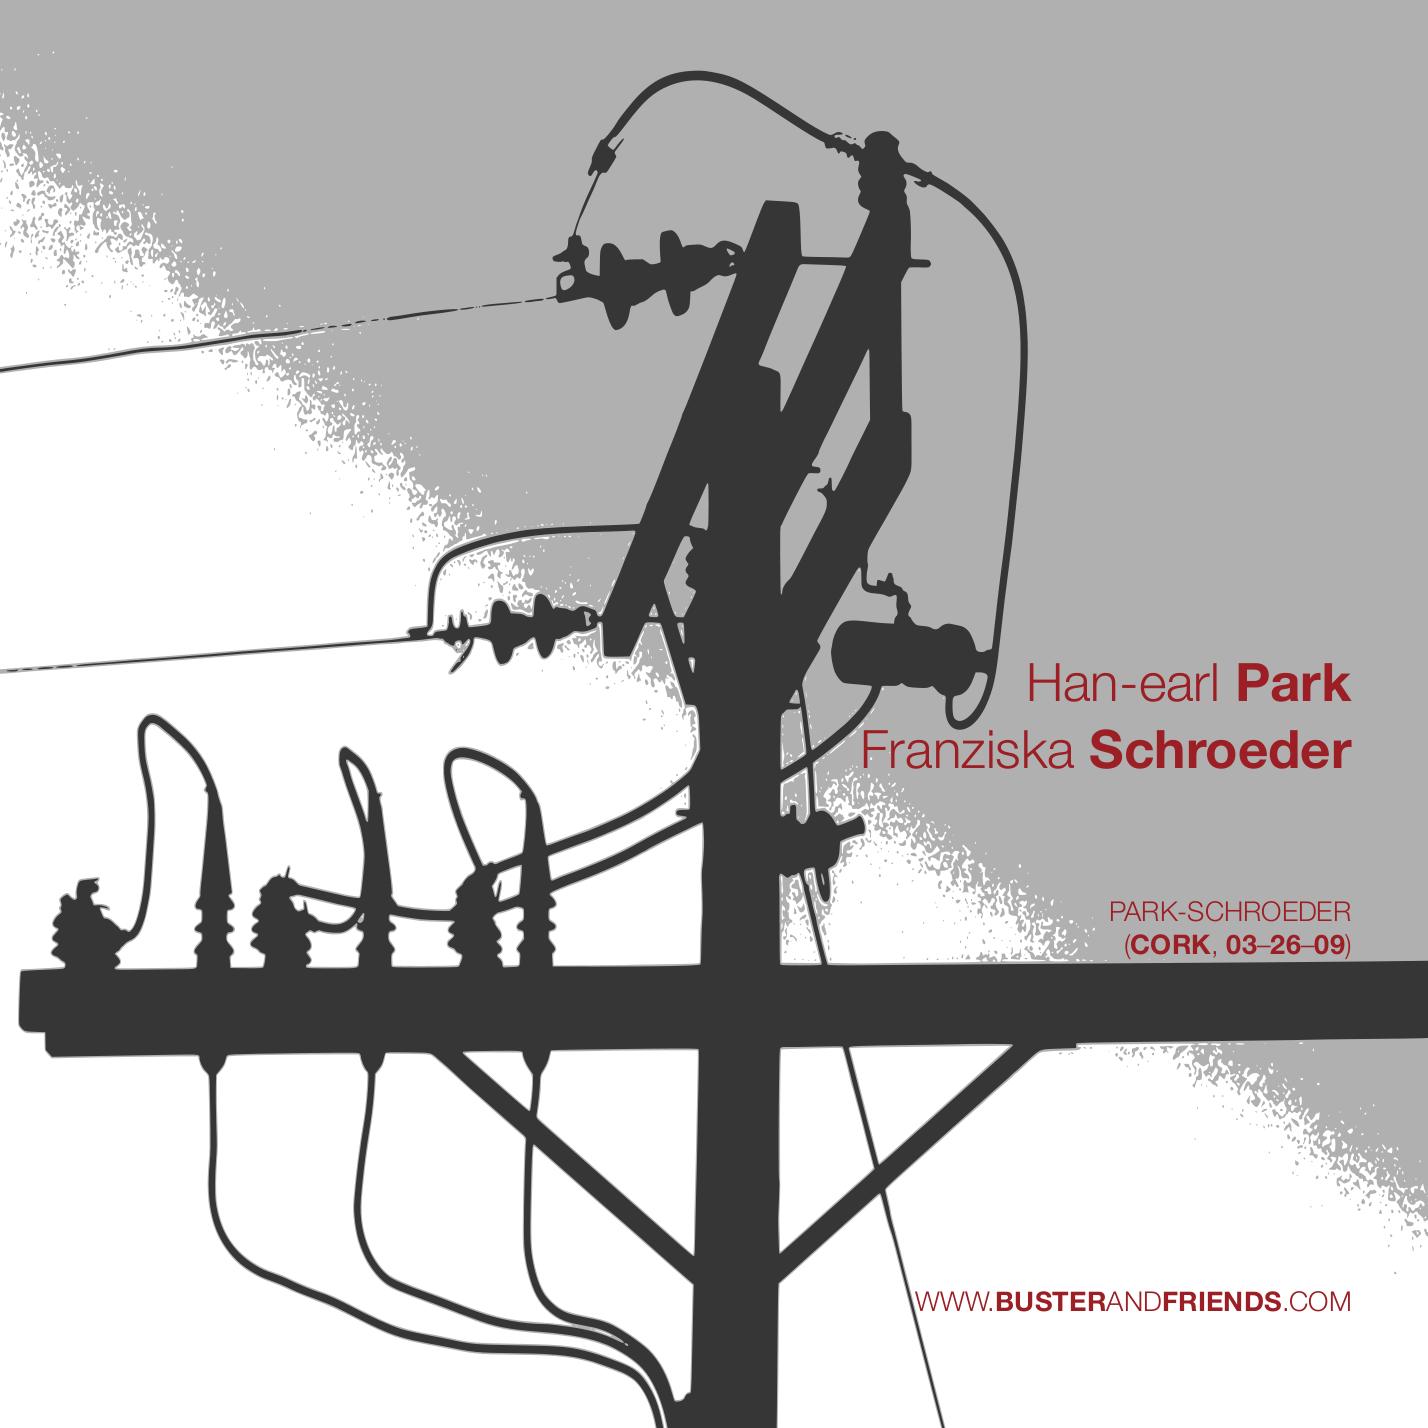 Han-earl Park and Franziska Schroeder: Park-Schroeder (Cork, 03-26-09)